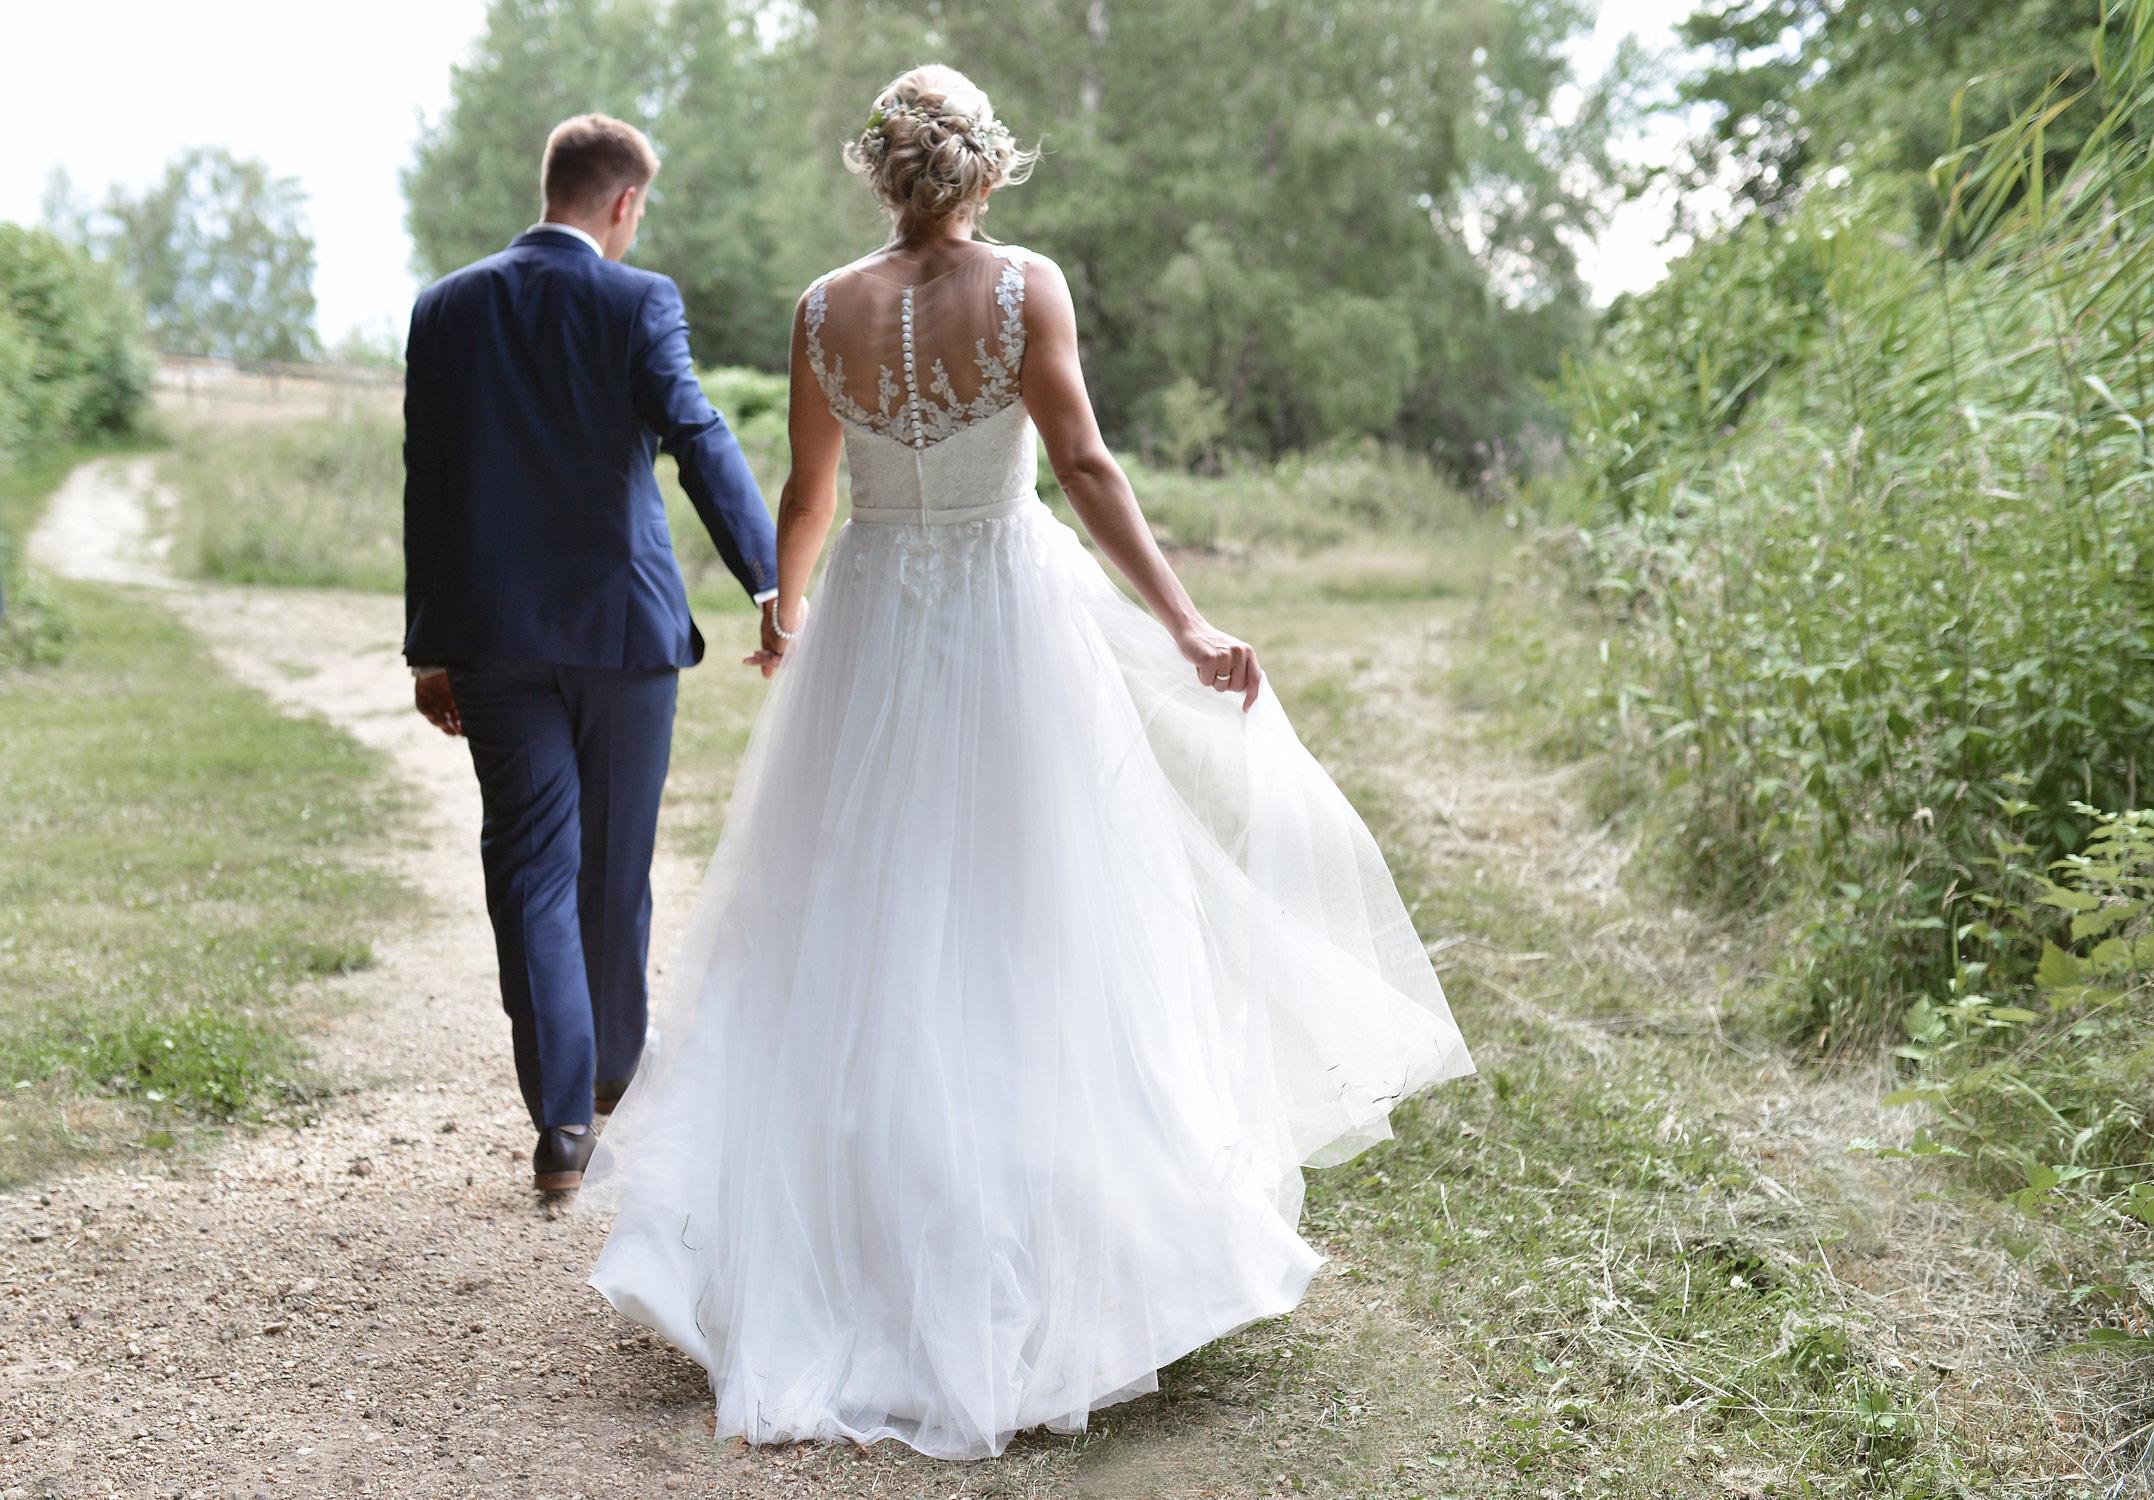 Hochzeit_Westerwald_Nicole-Bouillon-Fotografie